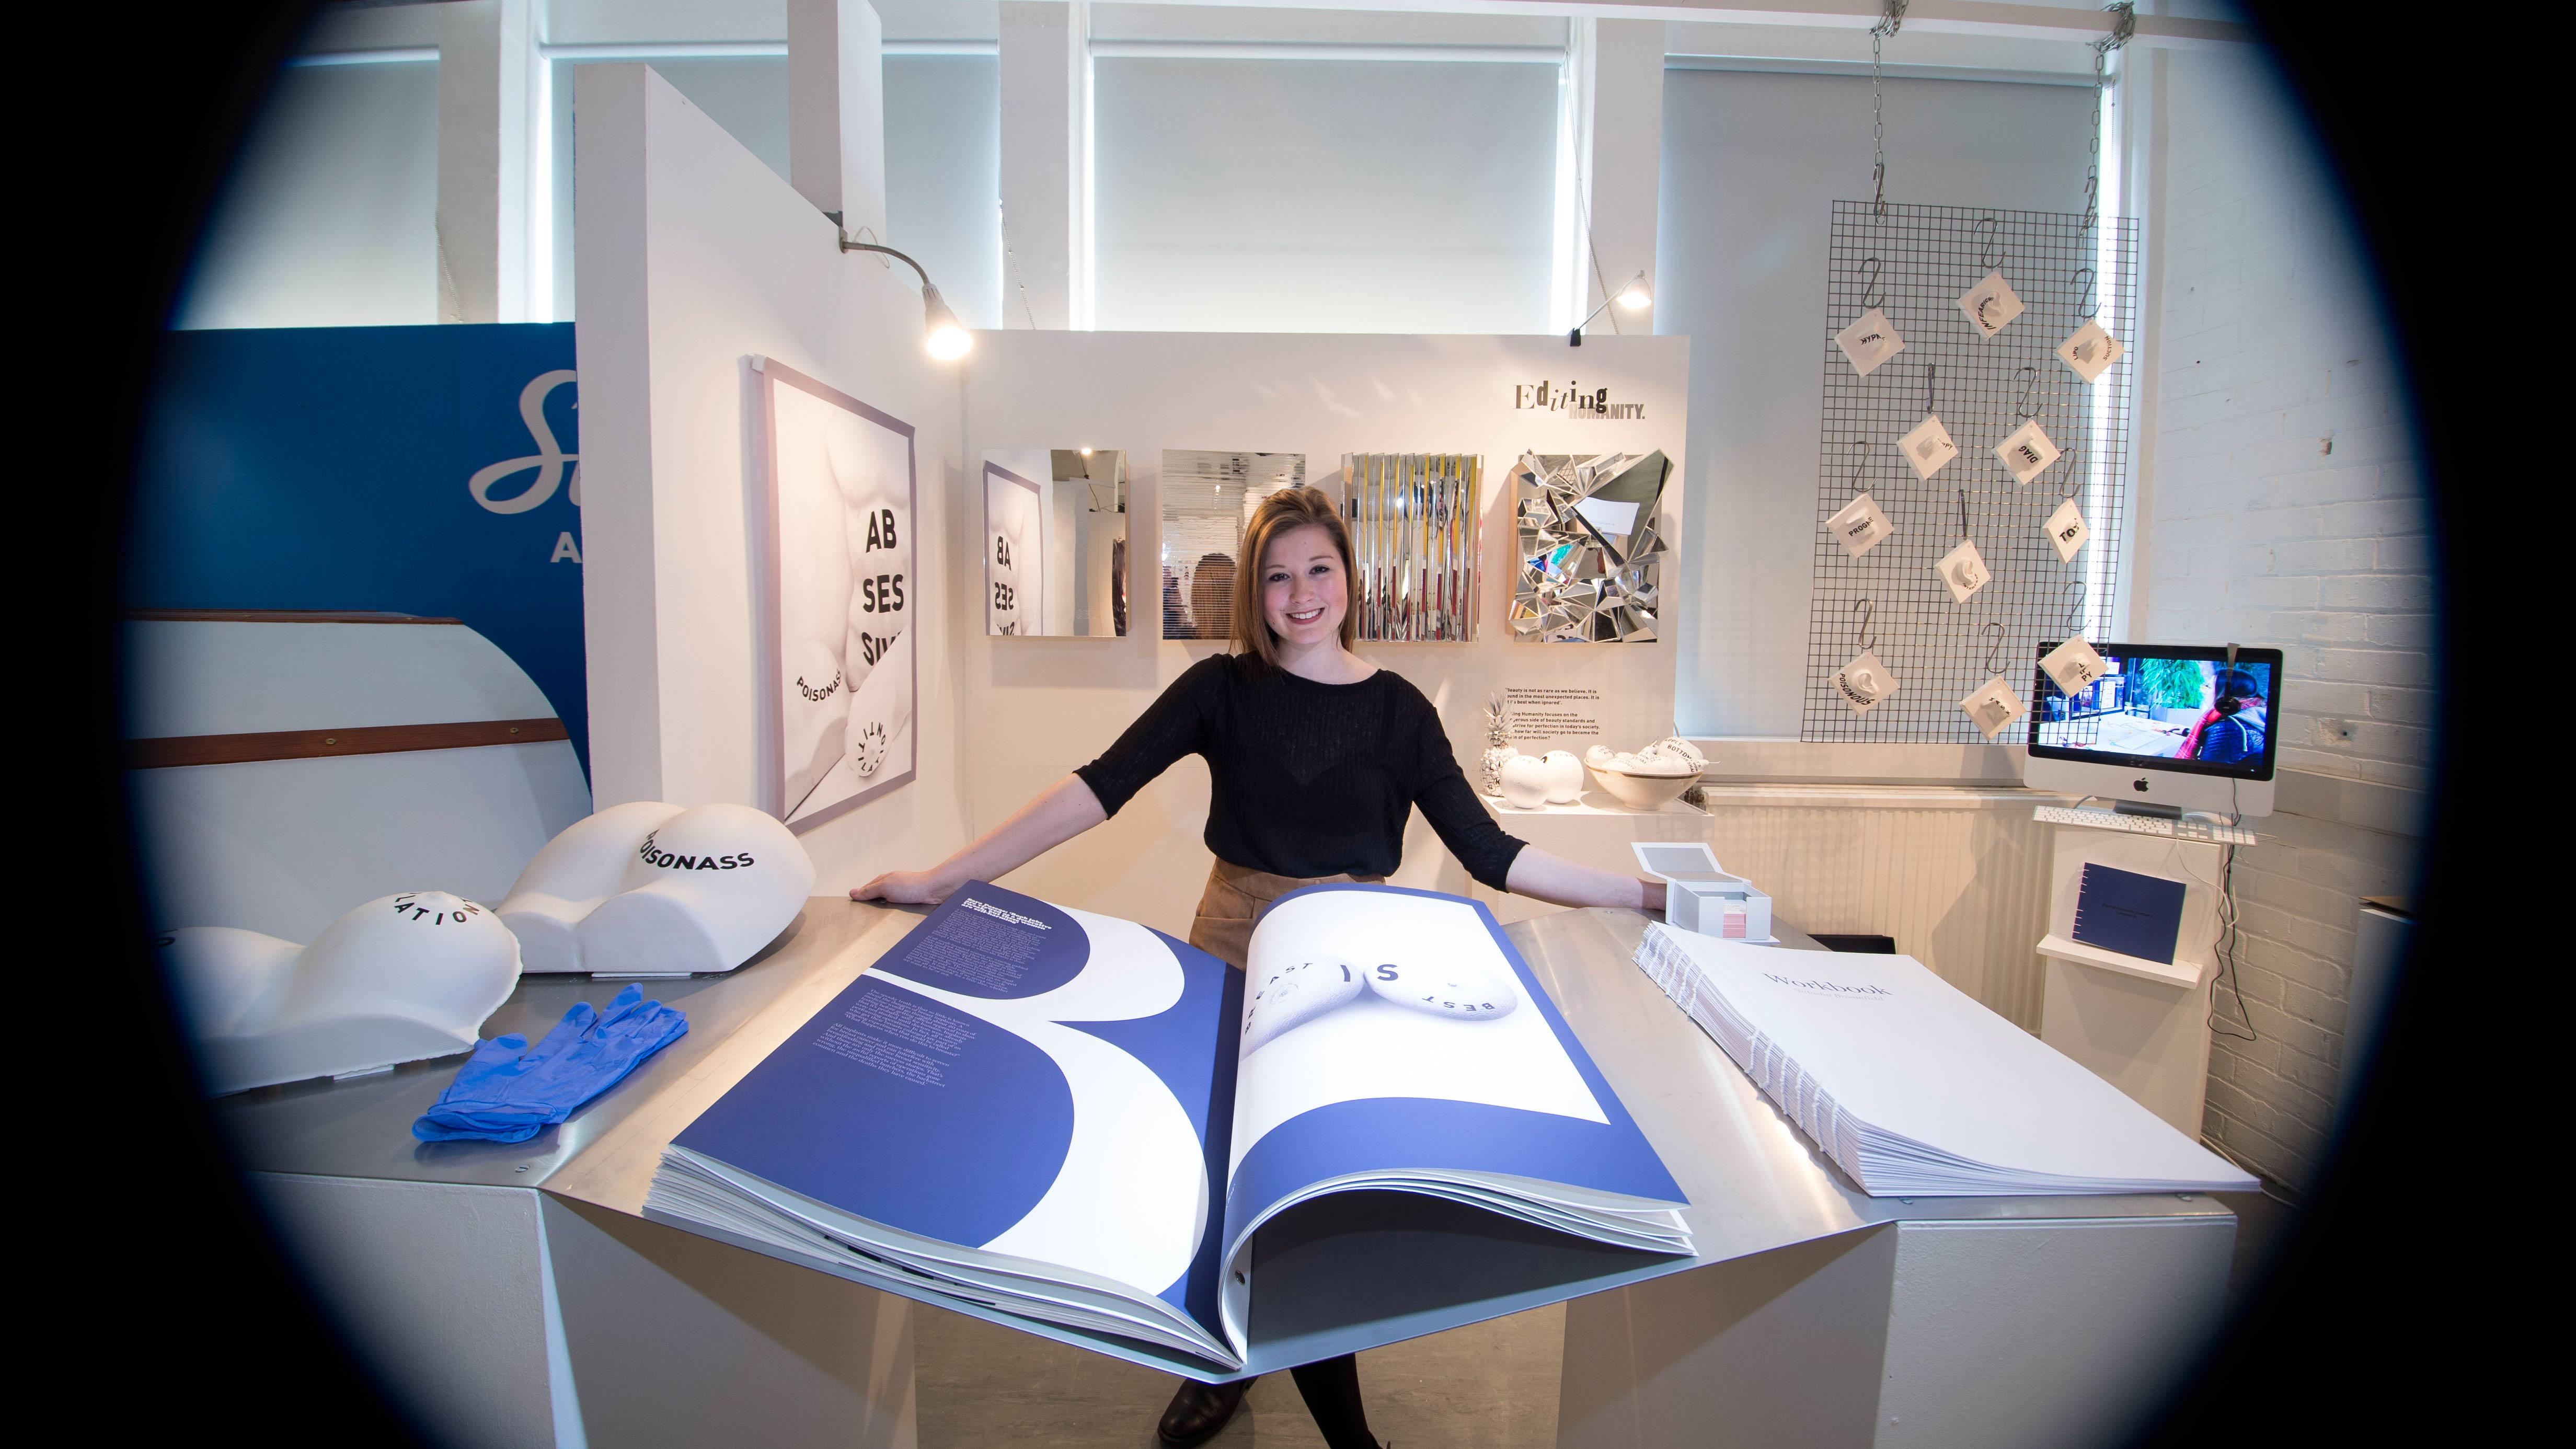 Edinburgh Napier: Natasha Broomfield